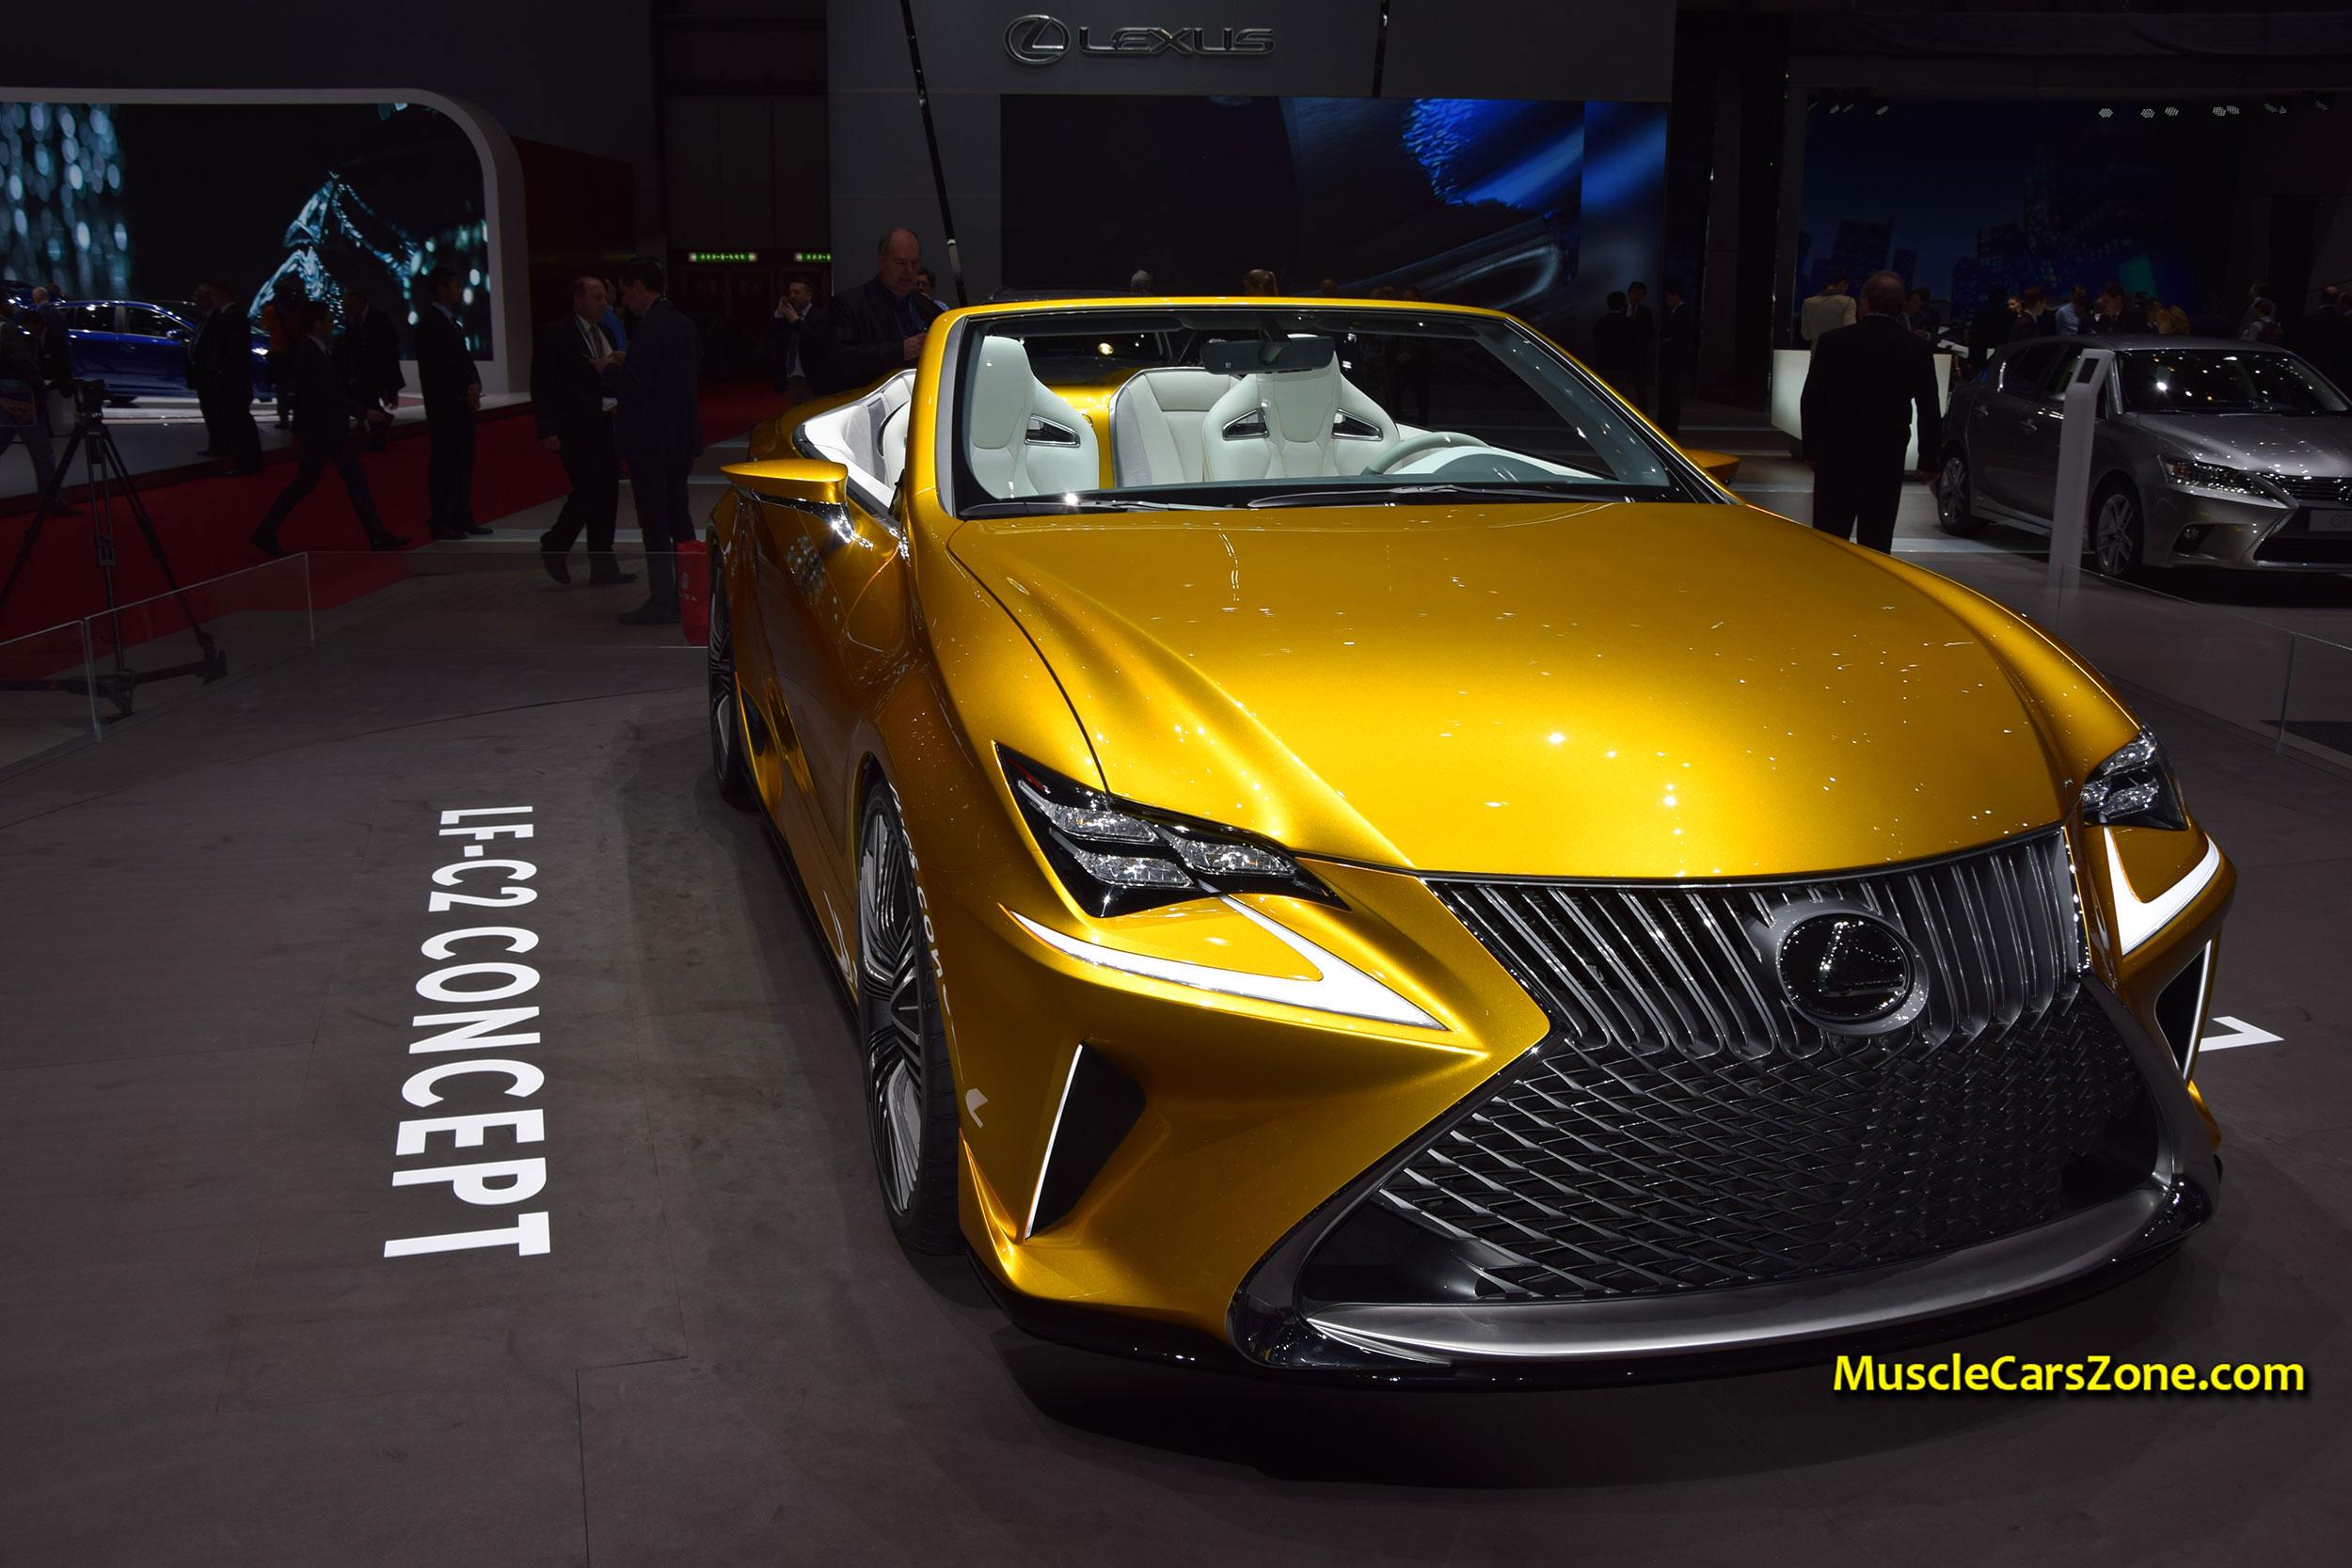 http://www.musclecarszone.com/wp-content/uploads/2015/03/2015-Lexus-LF-C2-Concept-05-2015-Geneva-Motor-Show-.jpg